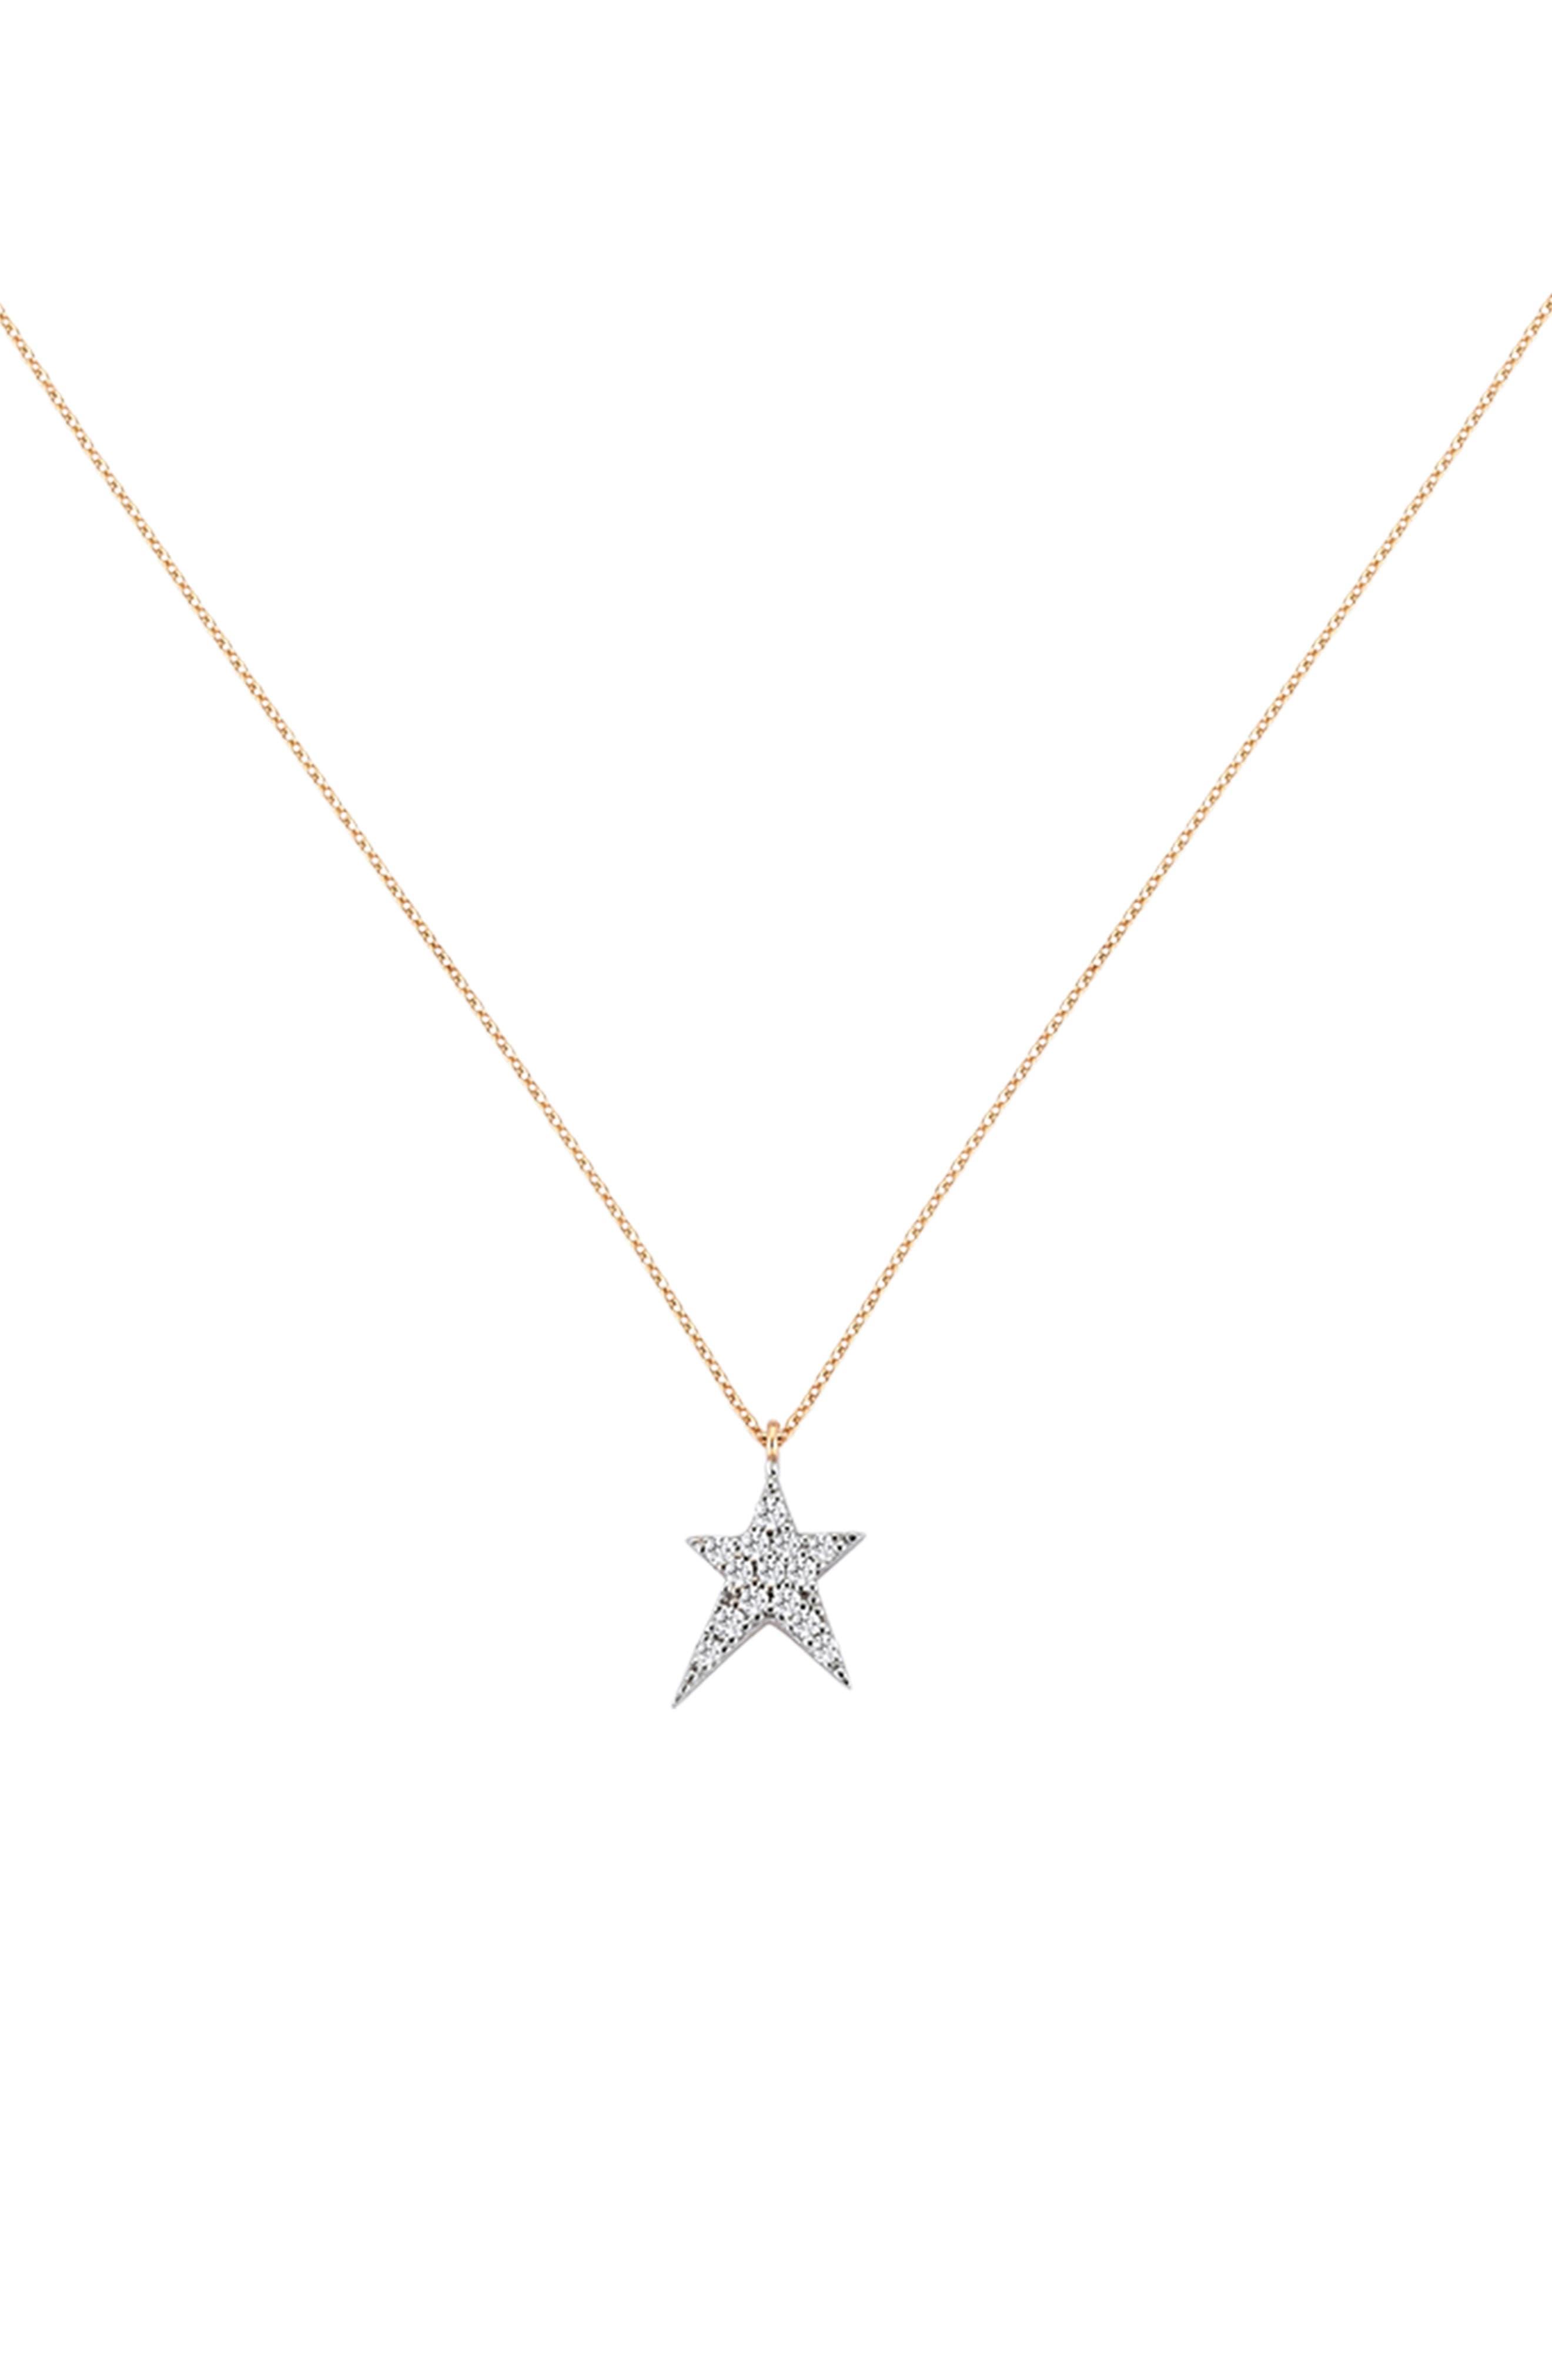 KISMET BY MILKA, Struck Star Diamond Necklace, Main thumbnail 1, color, 712